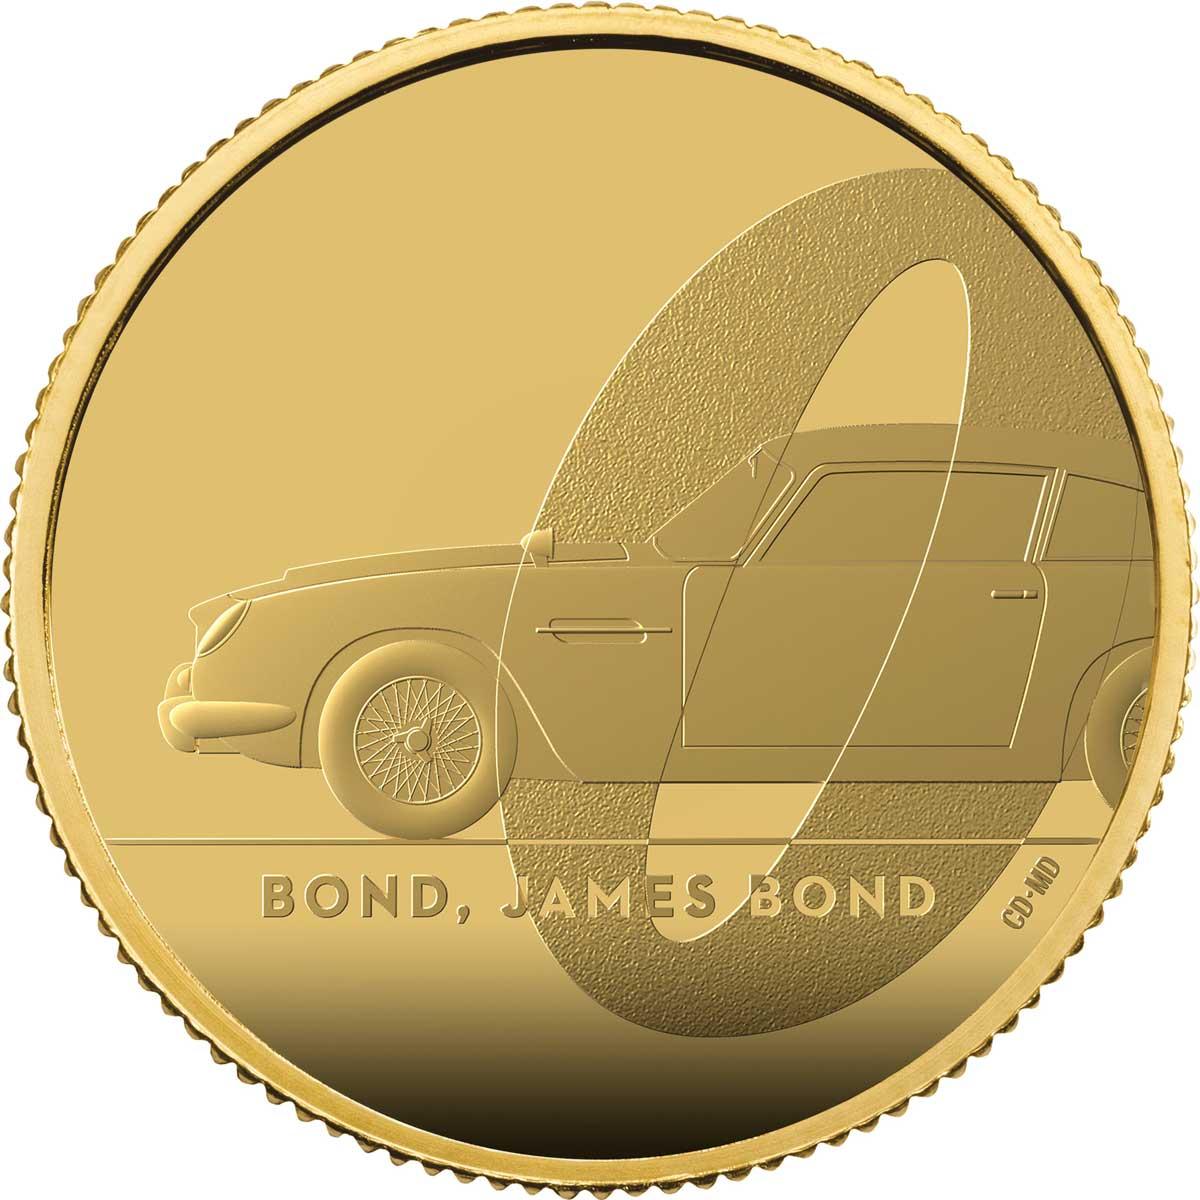 Bond, James Bond 2020 UK £25 1/4oz Gold Proof Coin